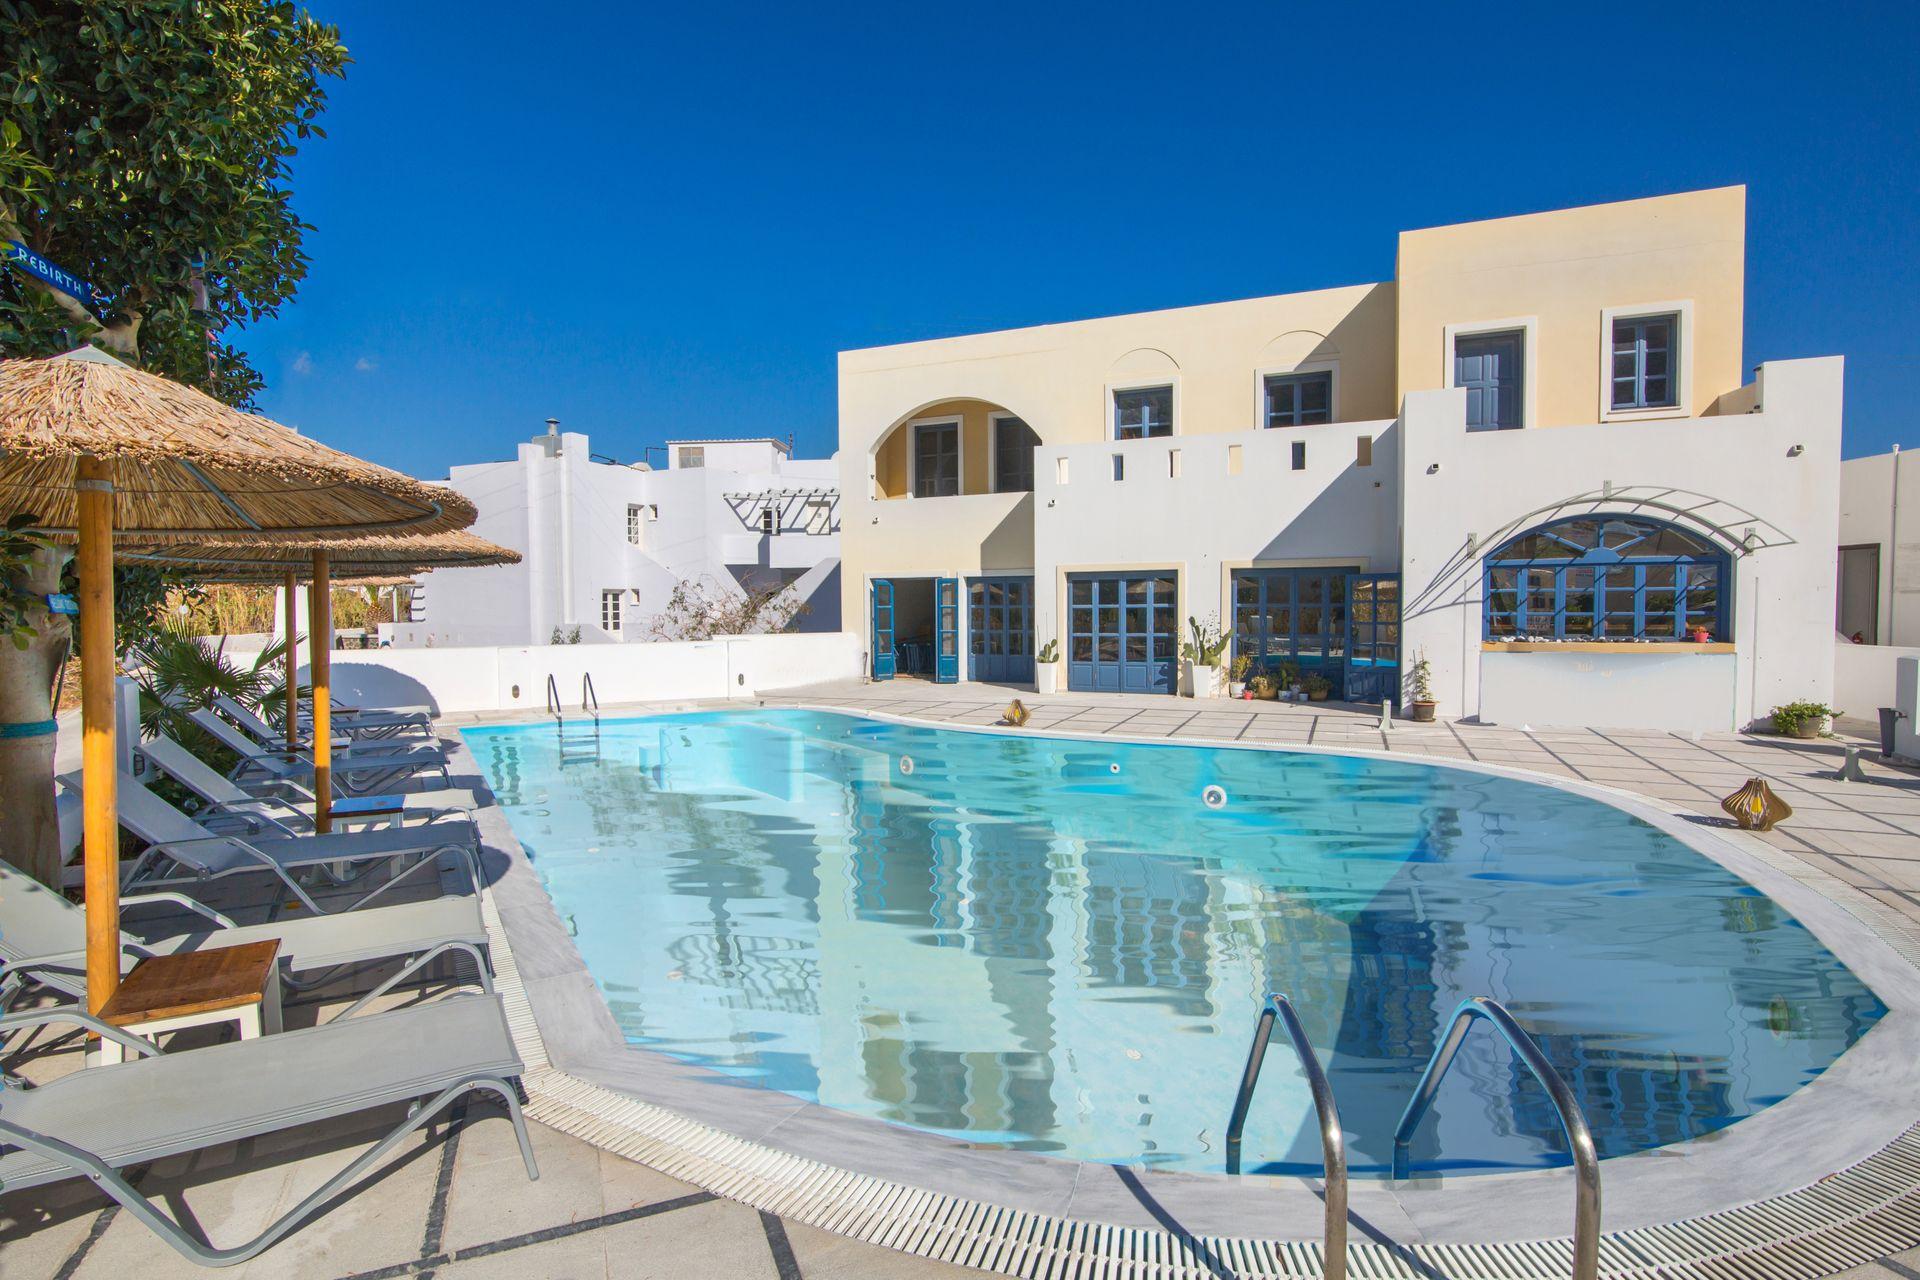 Sunshine Hotel - Σαντορίνη ✦ 3 Ημέρες (2 Διανυκτερεύσεις) ✦ 2 άτομα ✦ Πρωινό ✦ 01/09/2020 έως 30/09/2020 ✦ Υπέροχη Τοποθεσία!